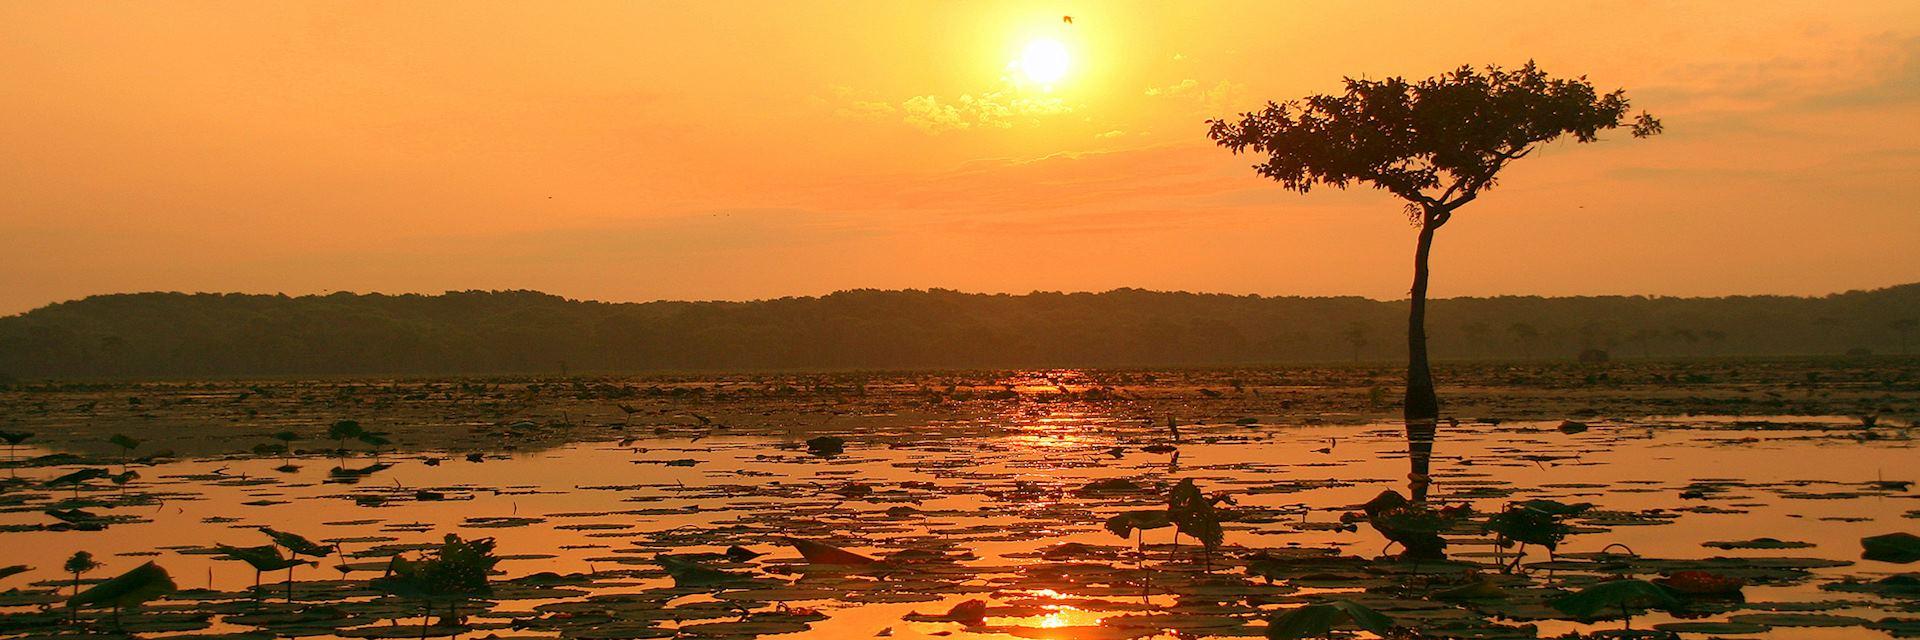 Lake Martin Nature Reserve, Lafayette, the USA